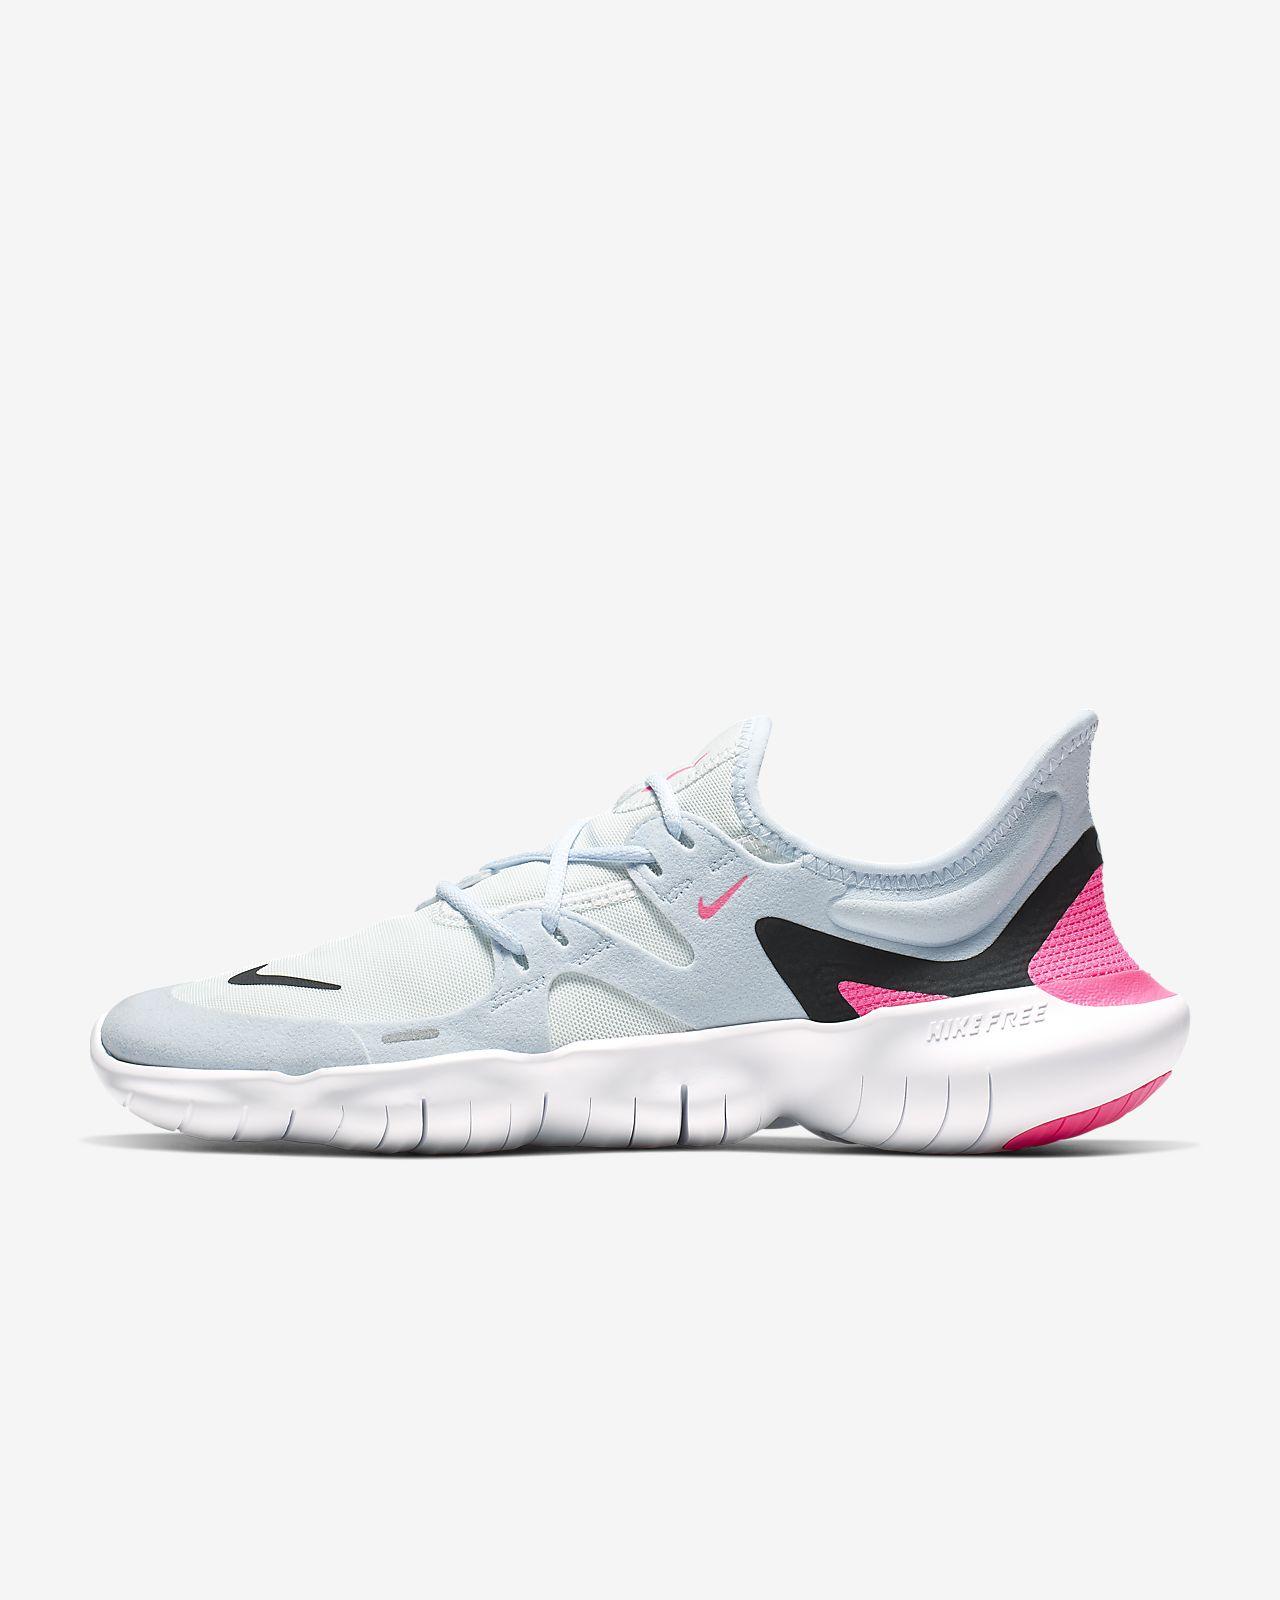 best sneakers a78cd a075d ... Chaussure de running Nike Free RN 5.0 pour Femme